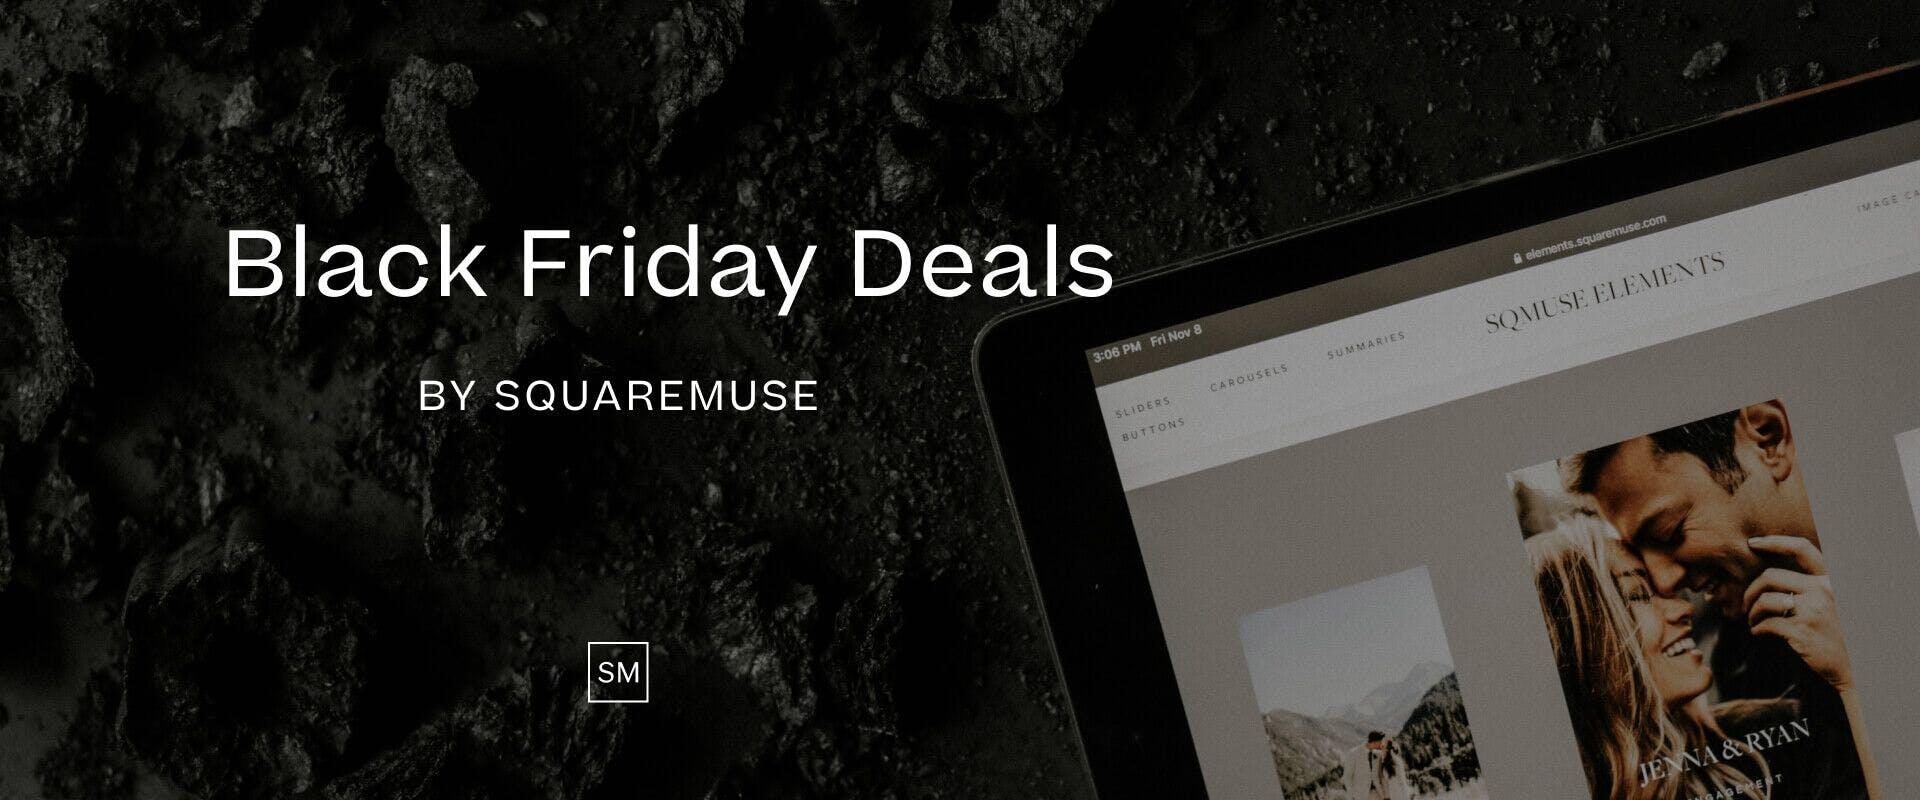 Squaremuse Black Friday deals for SquareSpace website templates